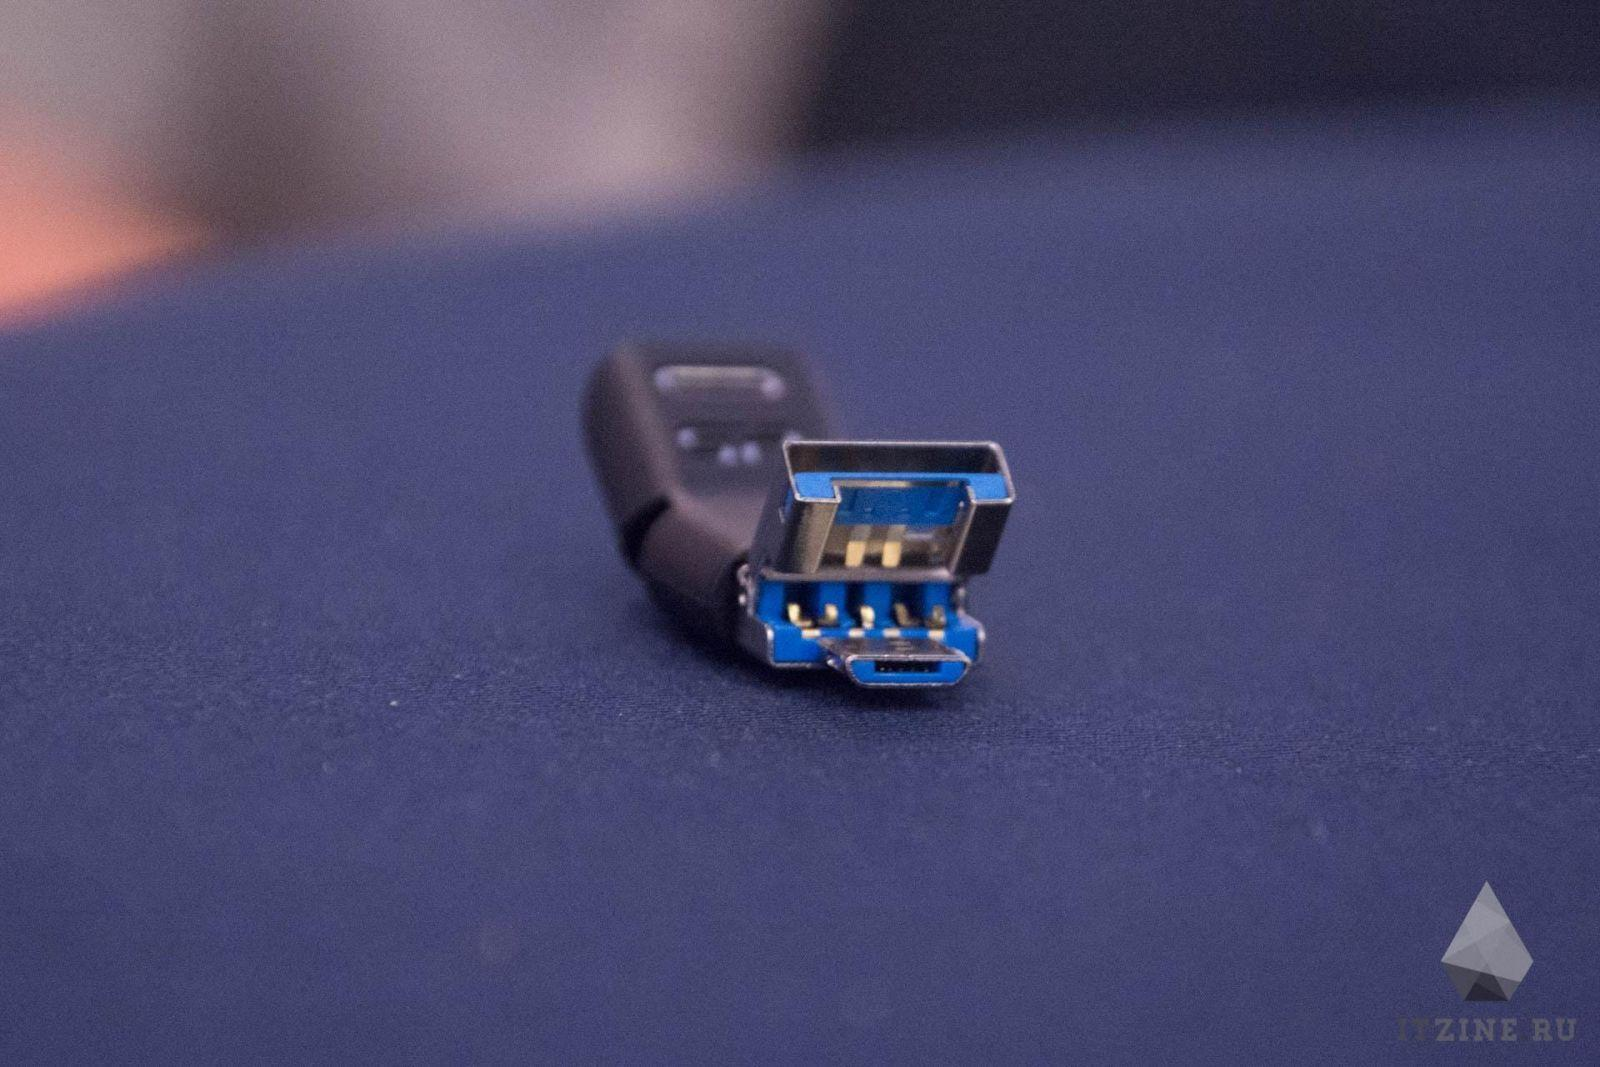 IFA 2017. Silicon Power сделала флешку с USB, USB-C и microUSB для смартфонов (DSC 5123)